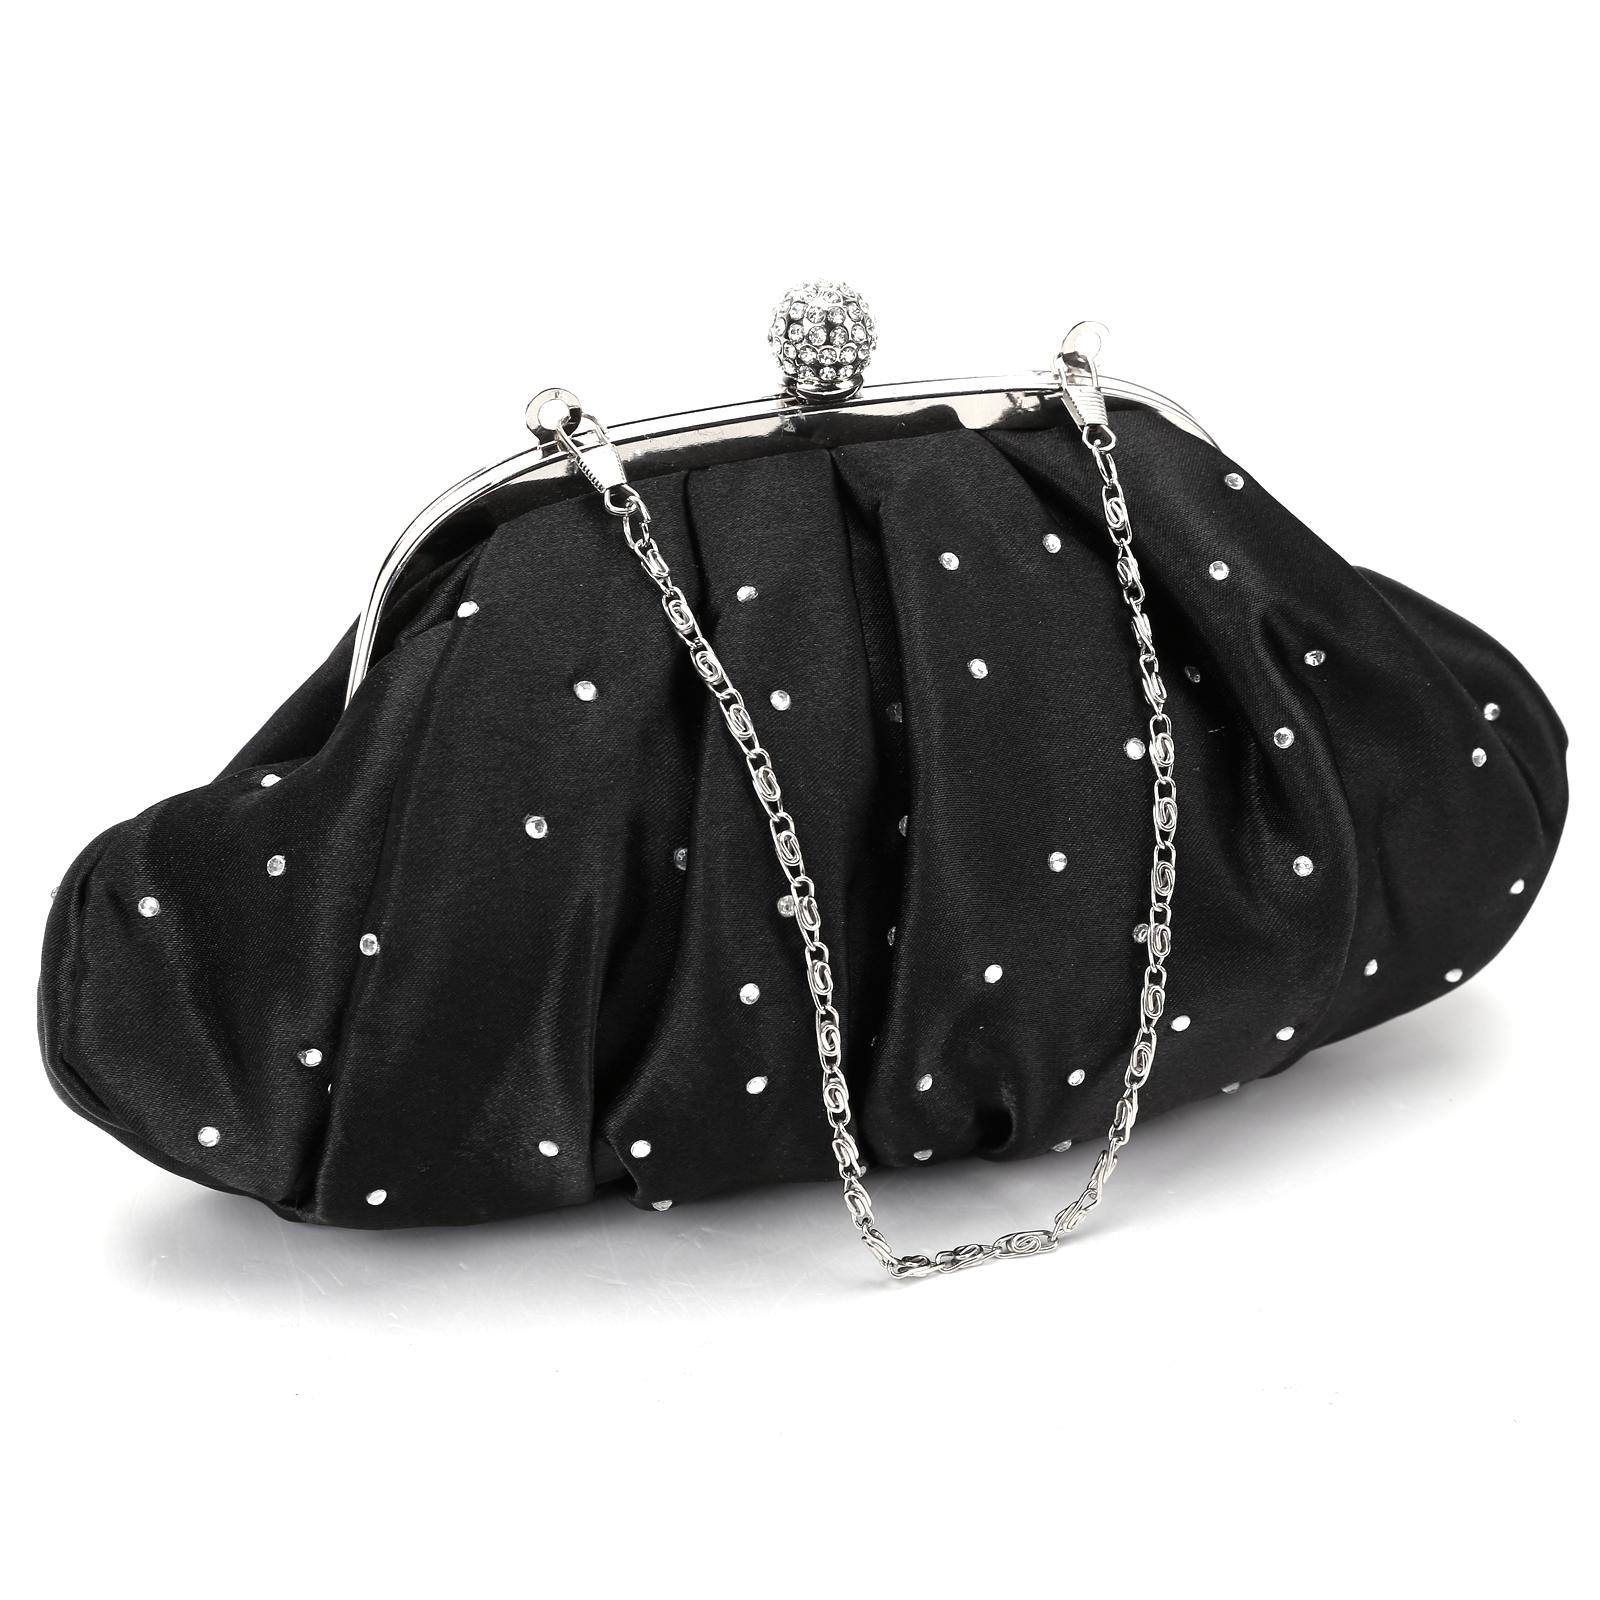 sparkling rhinestone Soft pouch clutch prom handbag crown top closes push lock